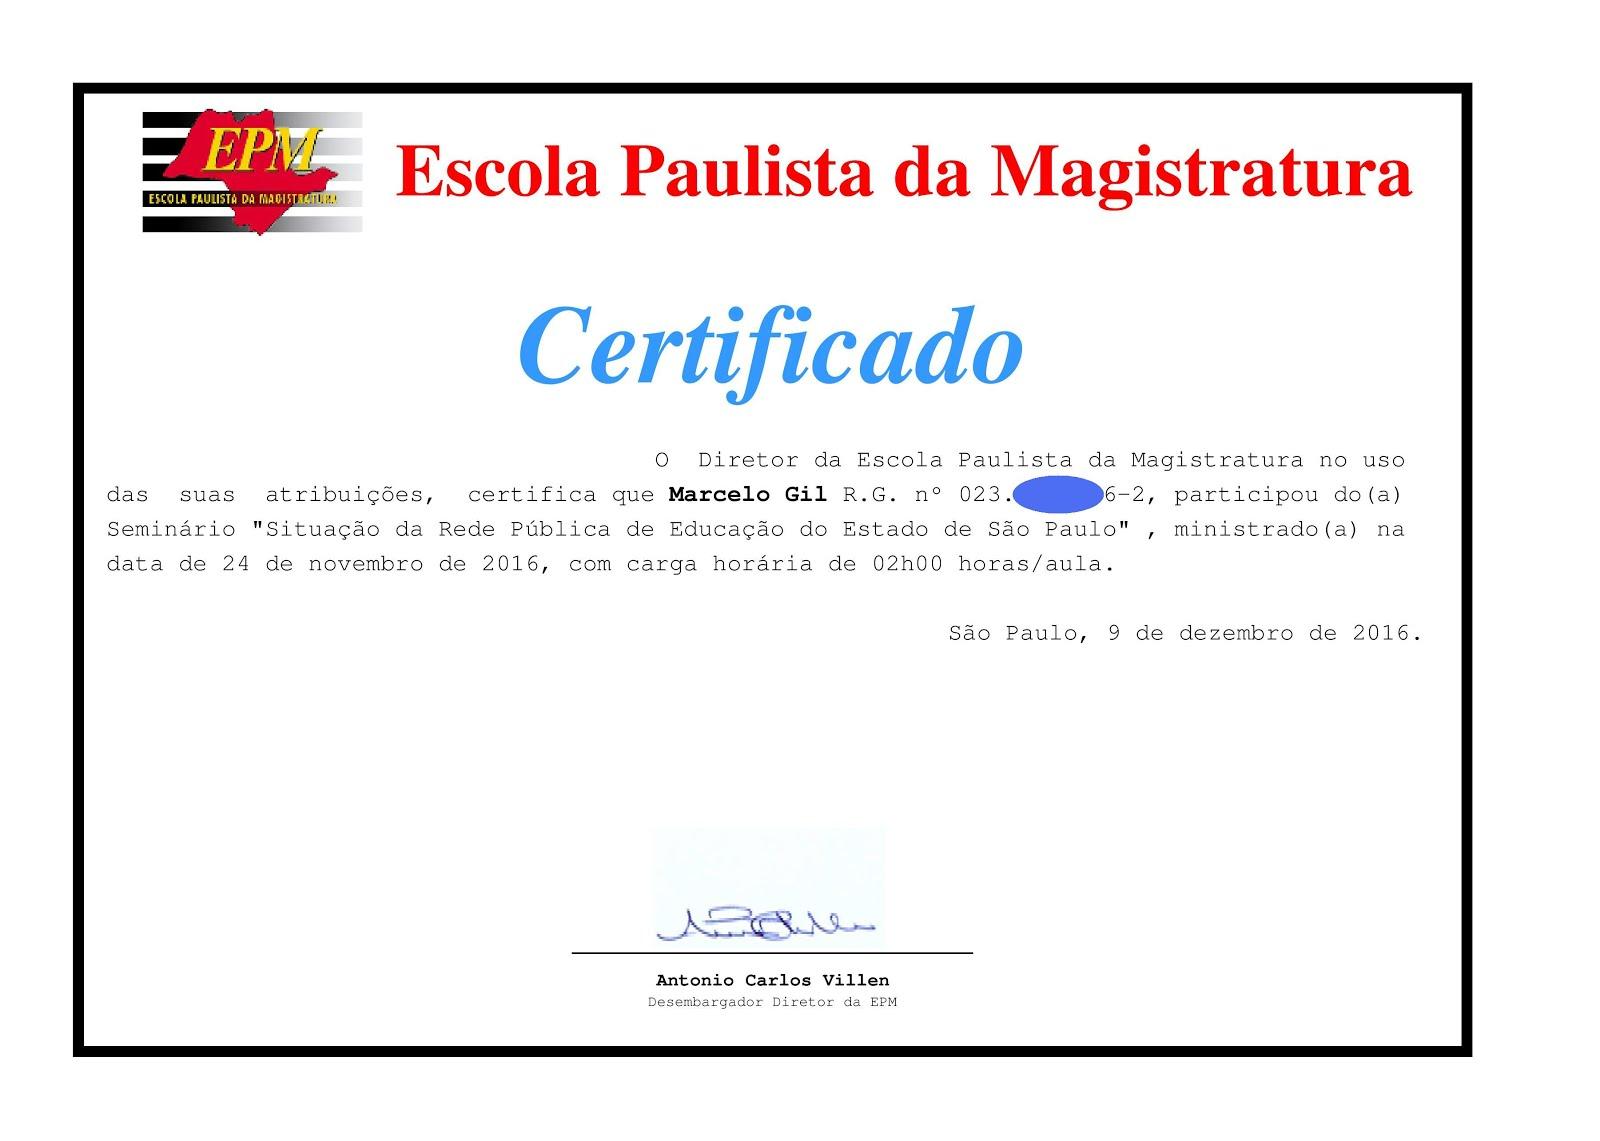 CERTIFICADO DA ESCOLA PAULISTA DE MAGISTRATURA CONCEDIDO À MARCELO GIL - 2016